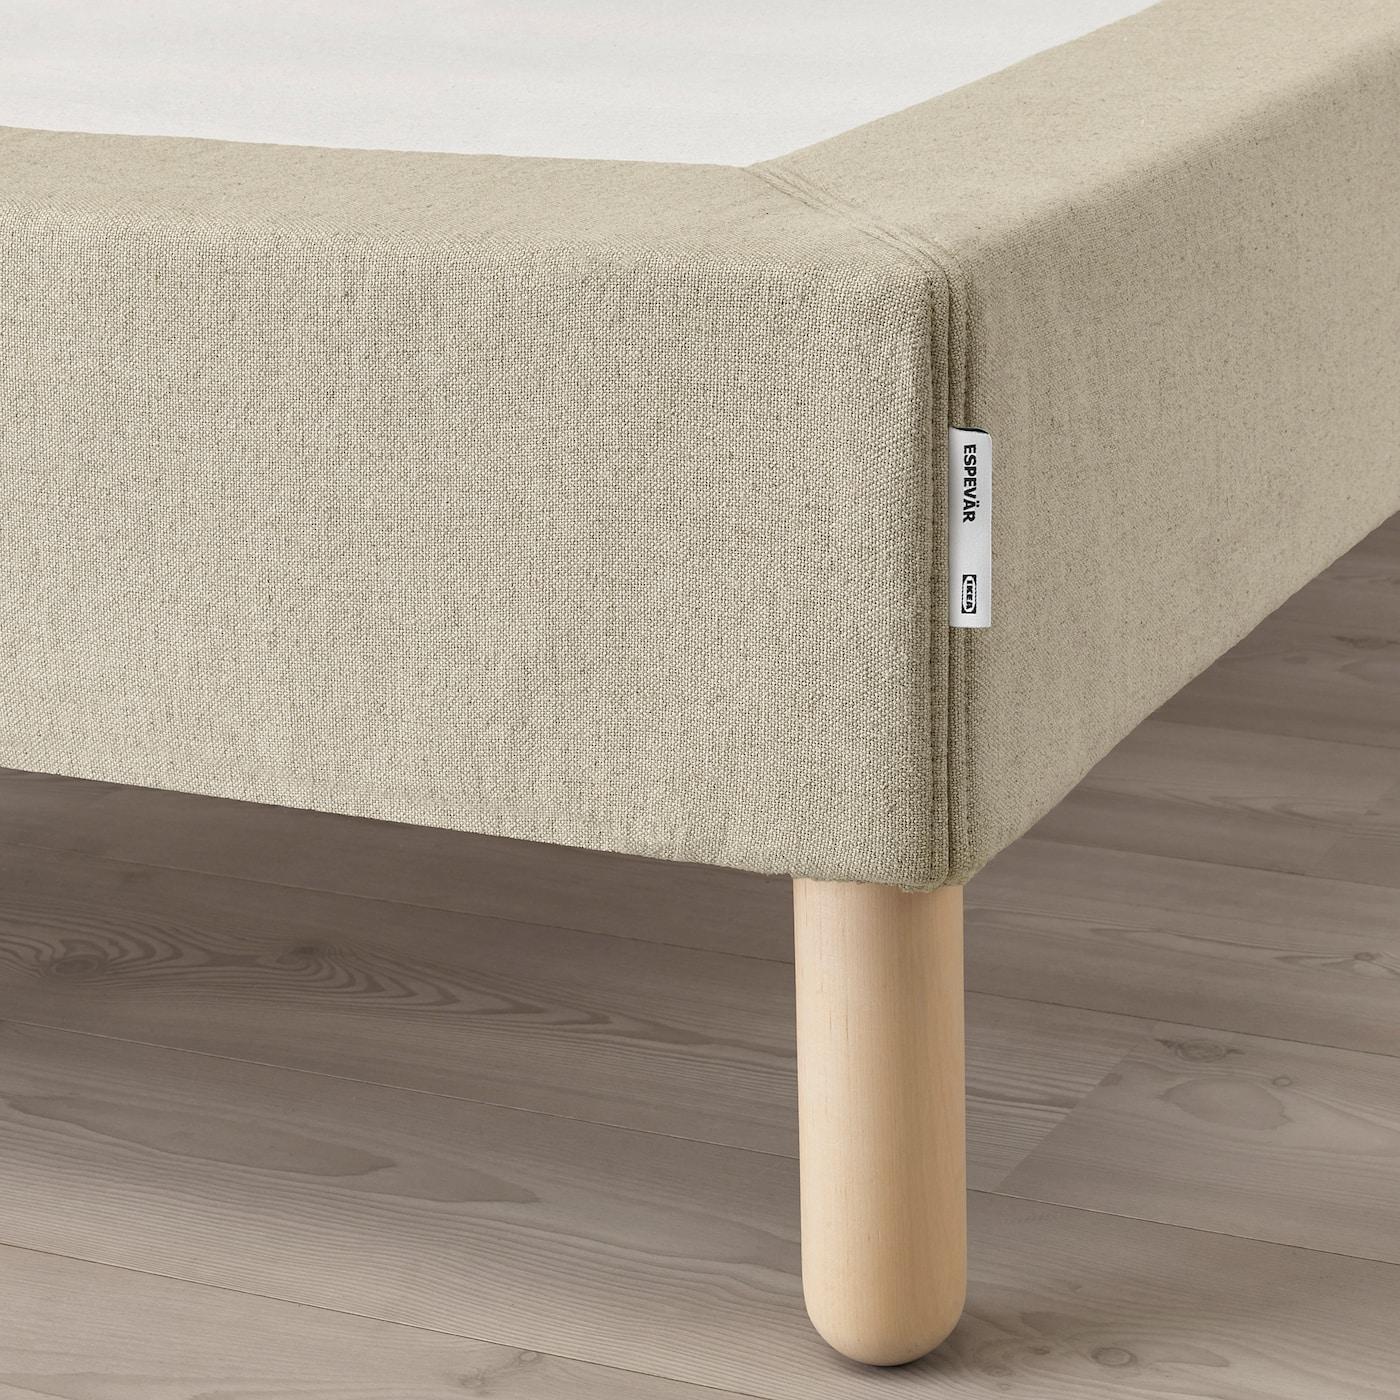 Wood Select Juego de 4/Patas de Madera de Cama Maciza Vernis Natural Altura 20/cm